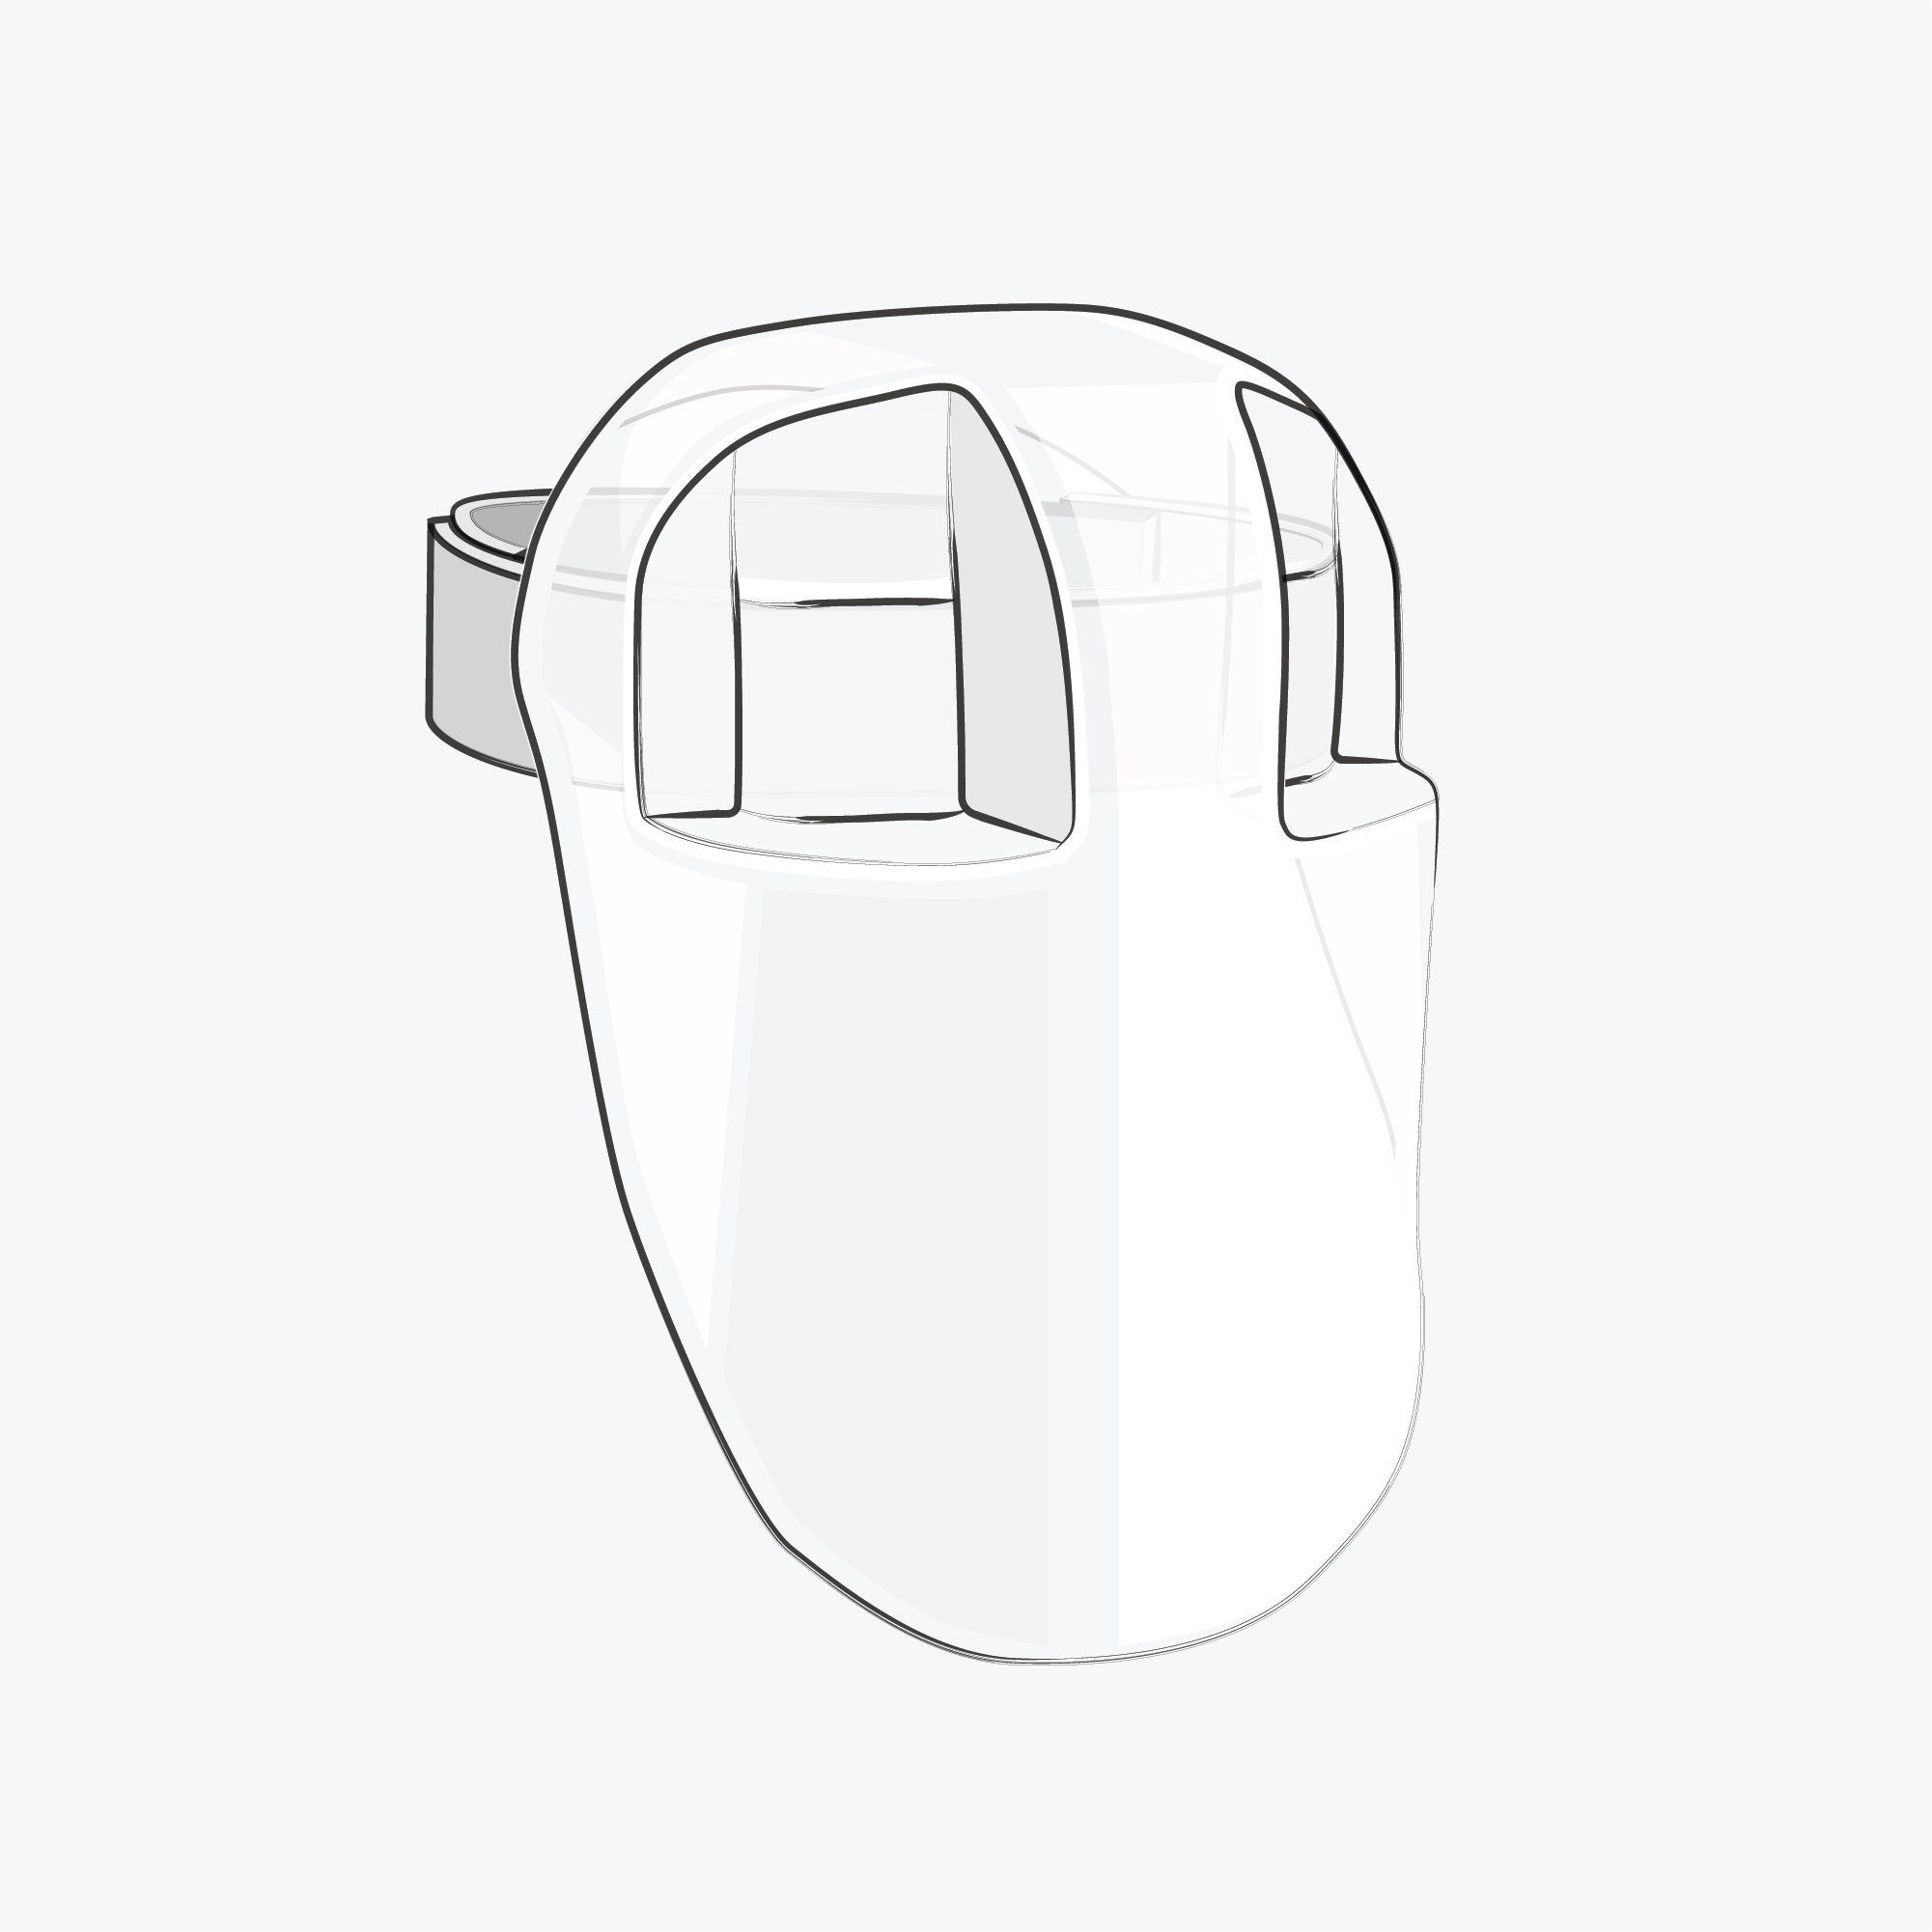 Maitri-Product-05-Shields-05